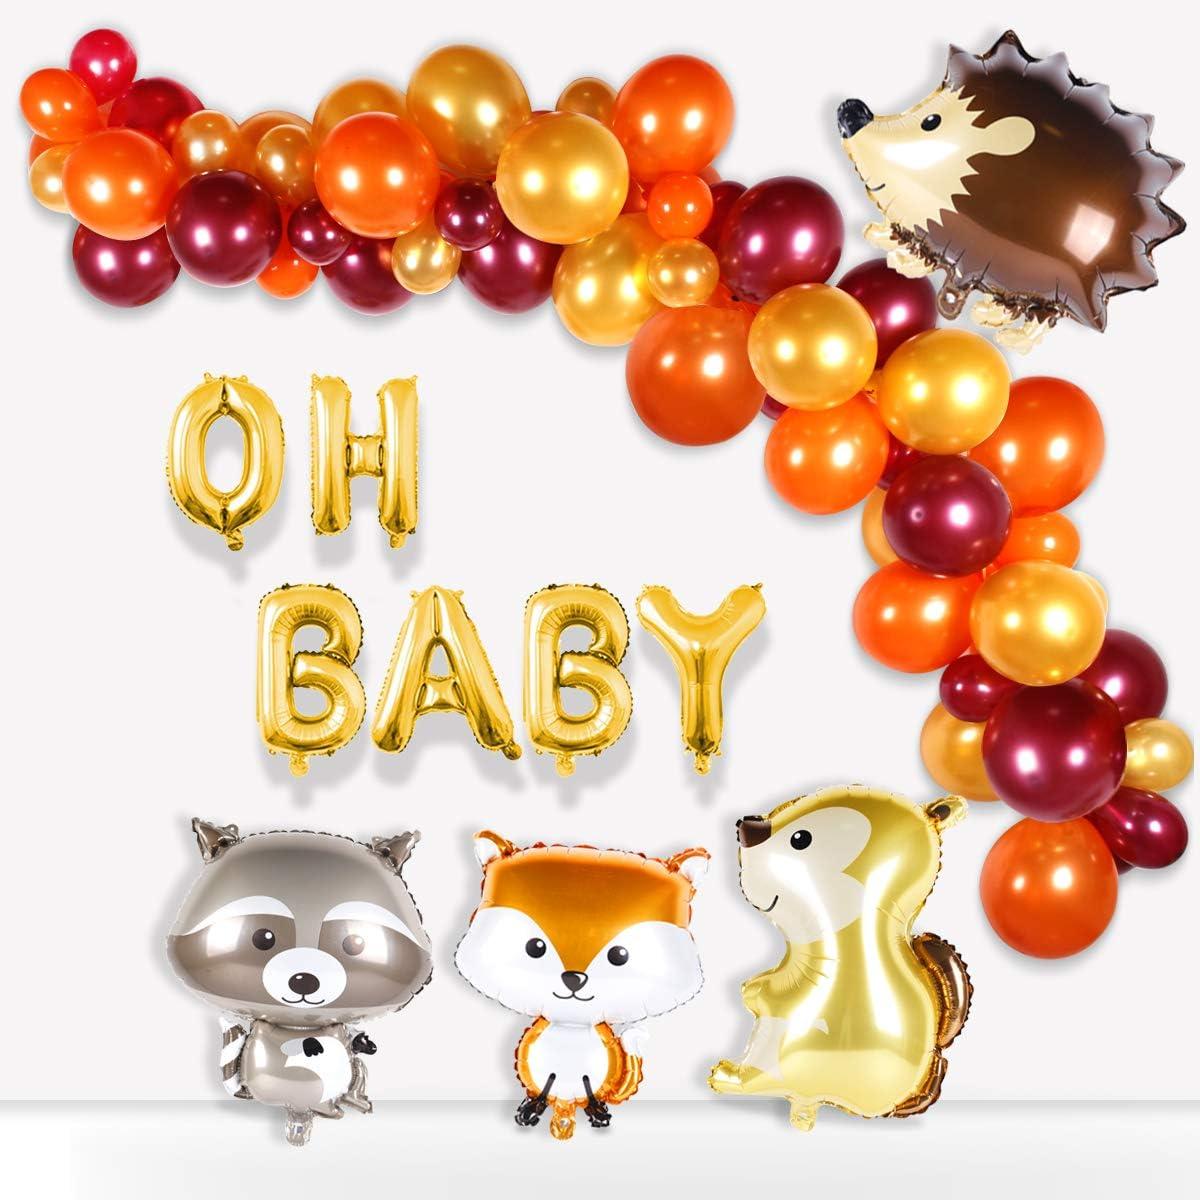 Woodland Baby Shower All items free shipping Balloon – Sacramento Mall B Garland Creatures